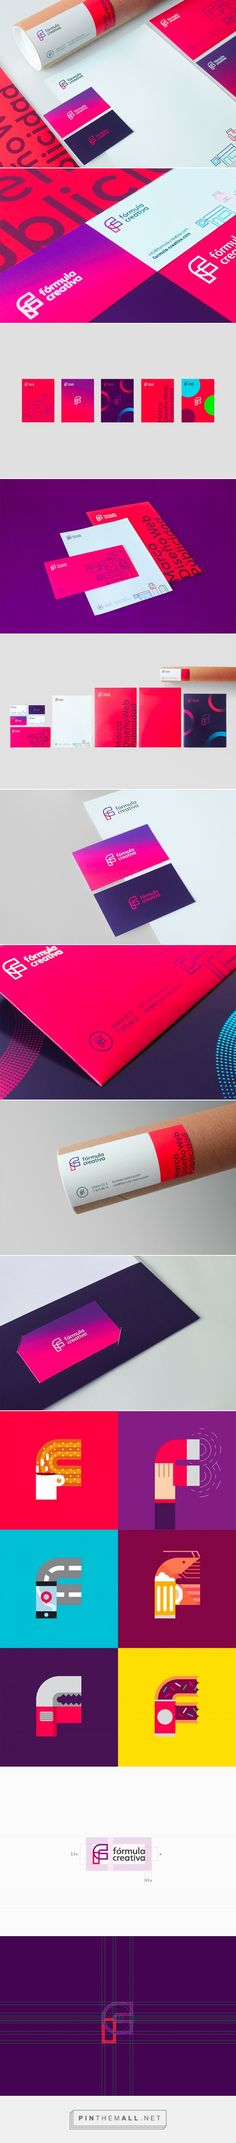 Fórmula Creativa Branding